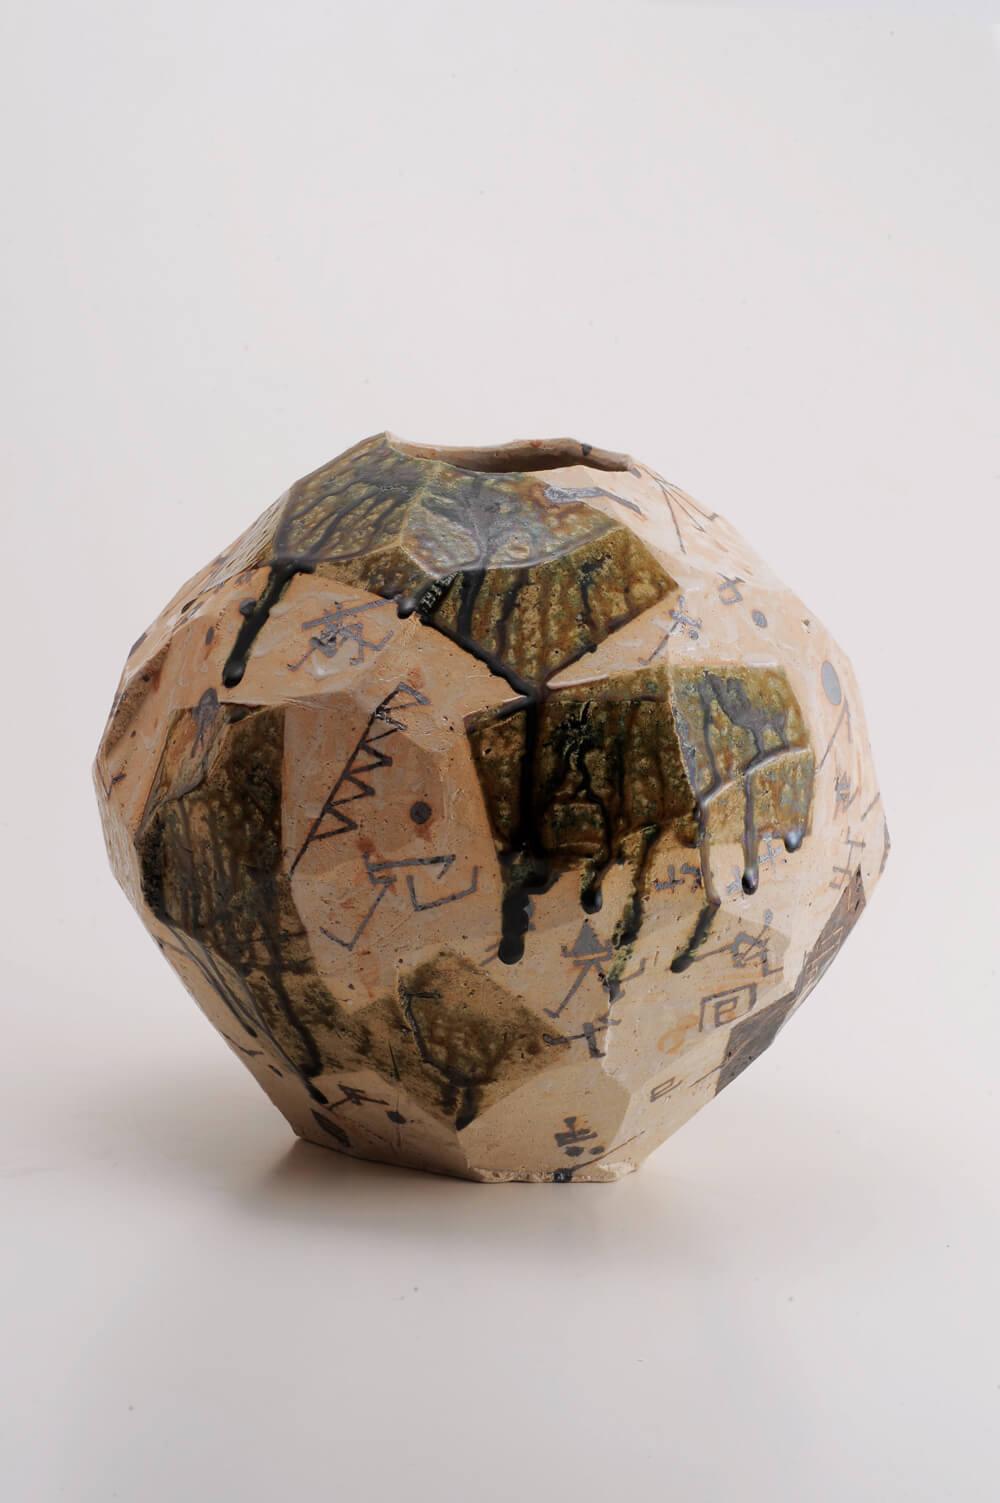 2011年6月25日から開催の「織部考 加藤 亮太郎 陶展」の加藤 亮太郎の作品画像1